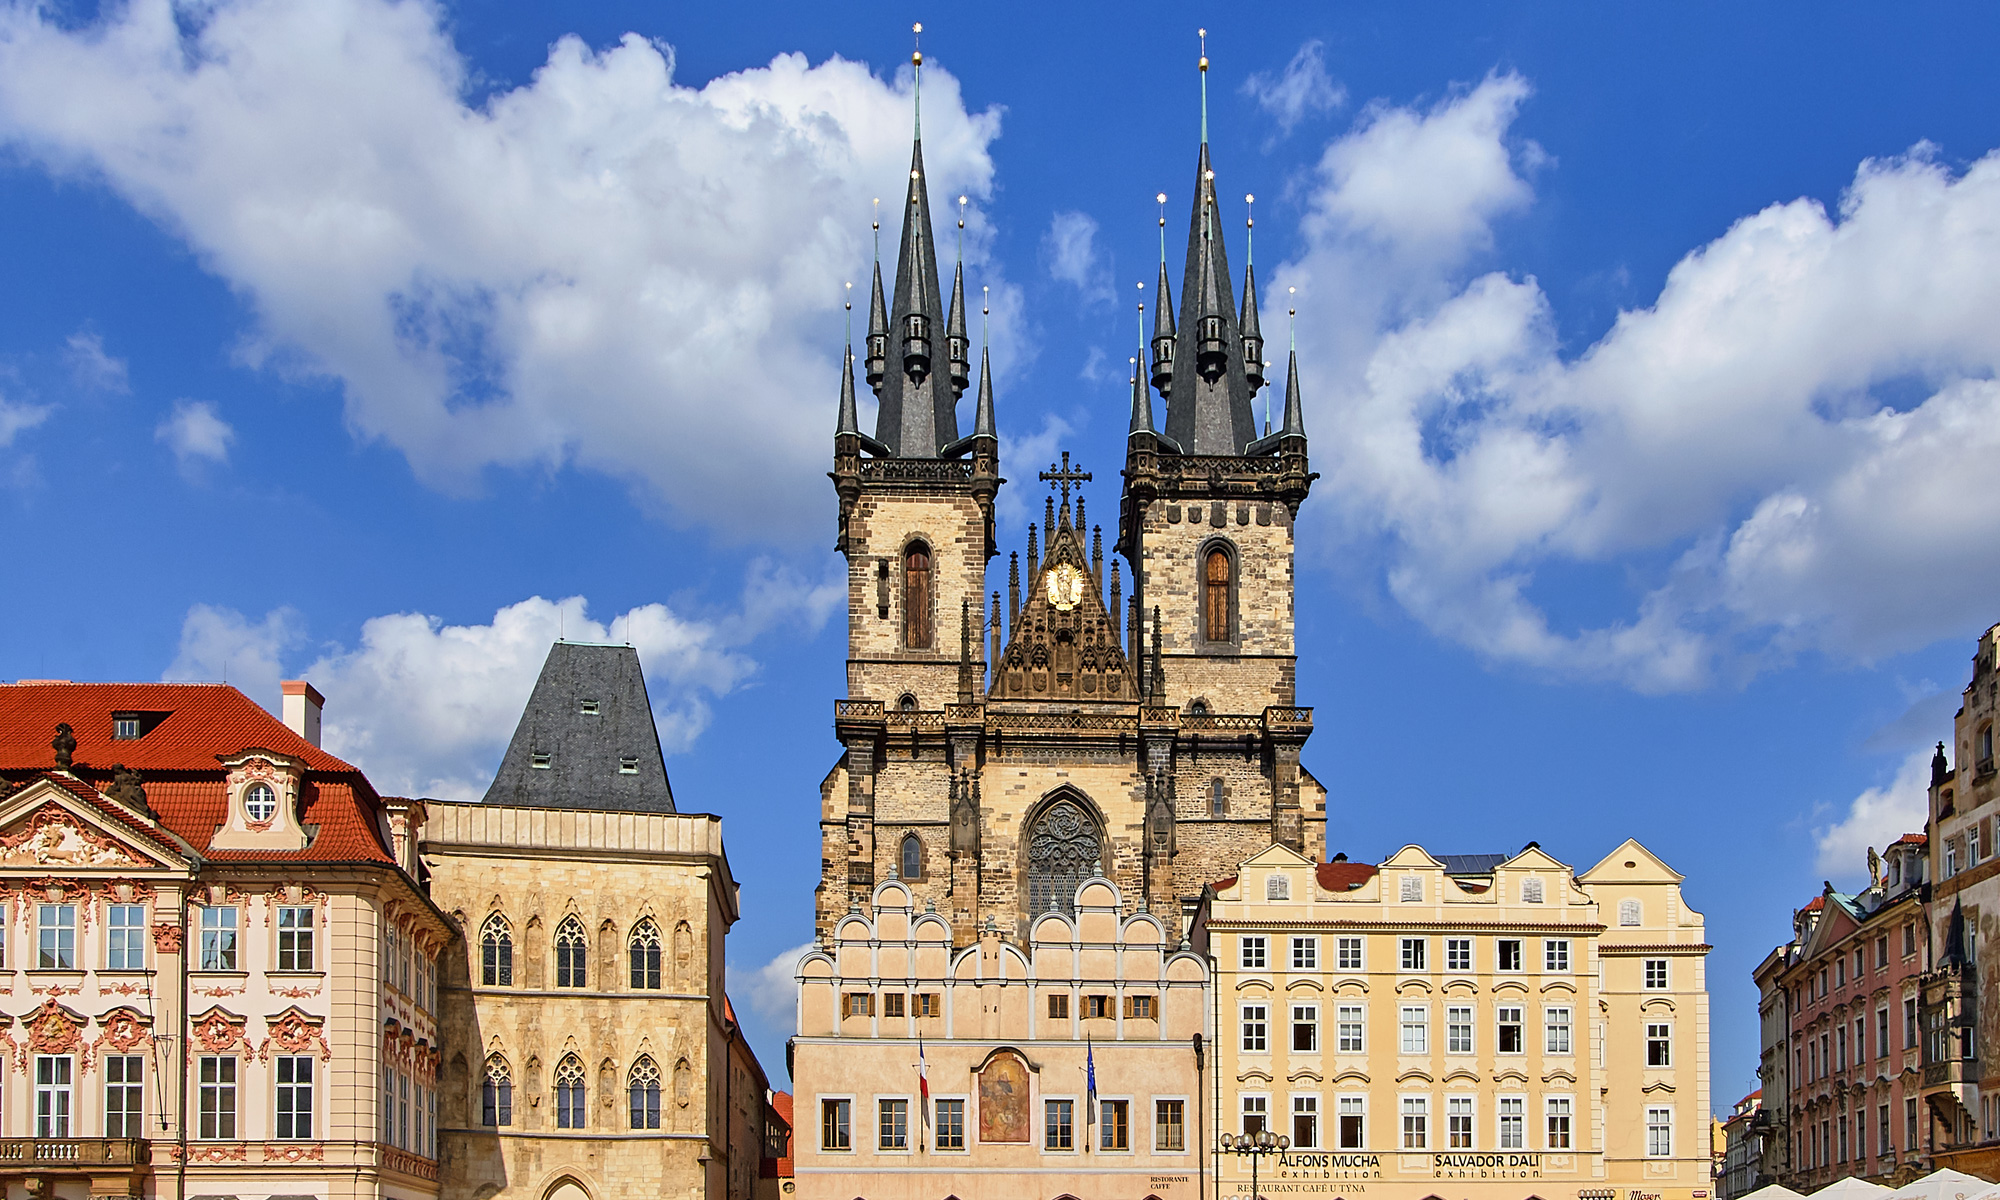 Principia College Study Abroad to Prague & the Czech Republic